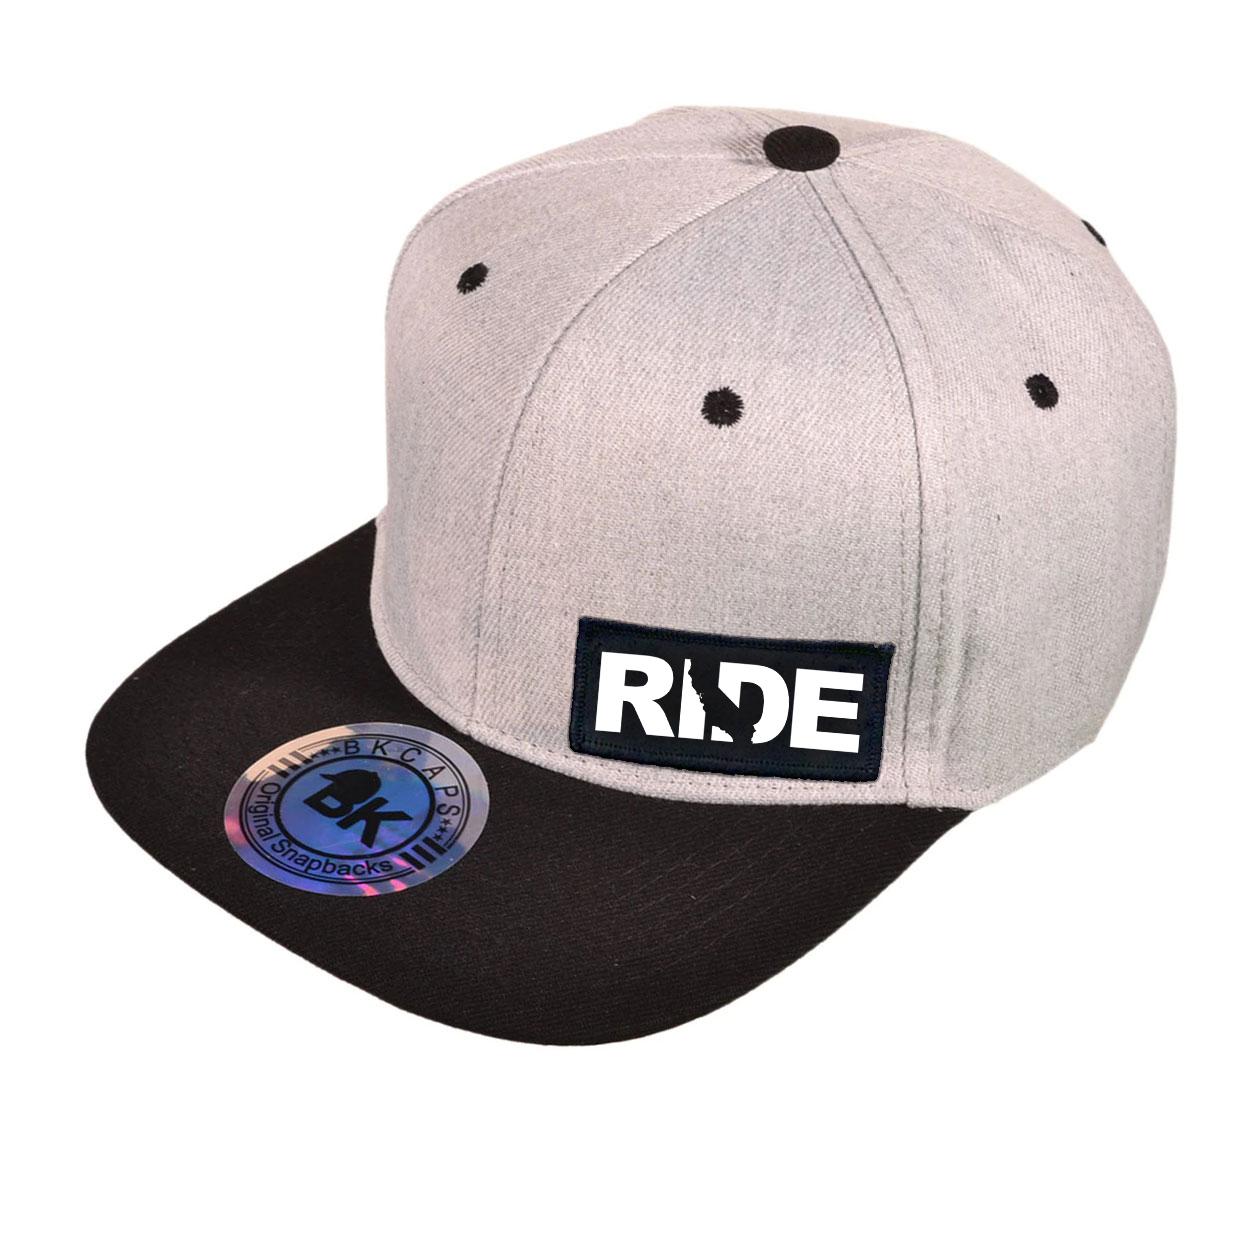 Ride California Night Out Woven Patch Snapback Flat Brim Hat Heather Gray/Black (White Logo)